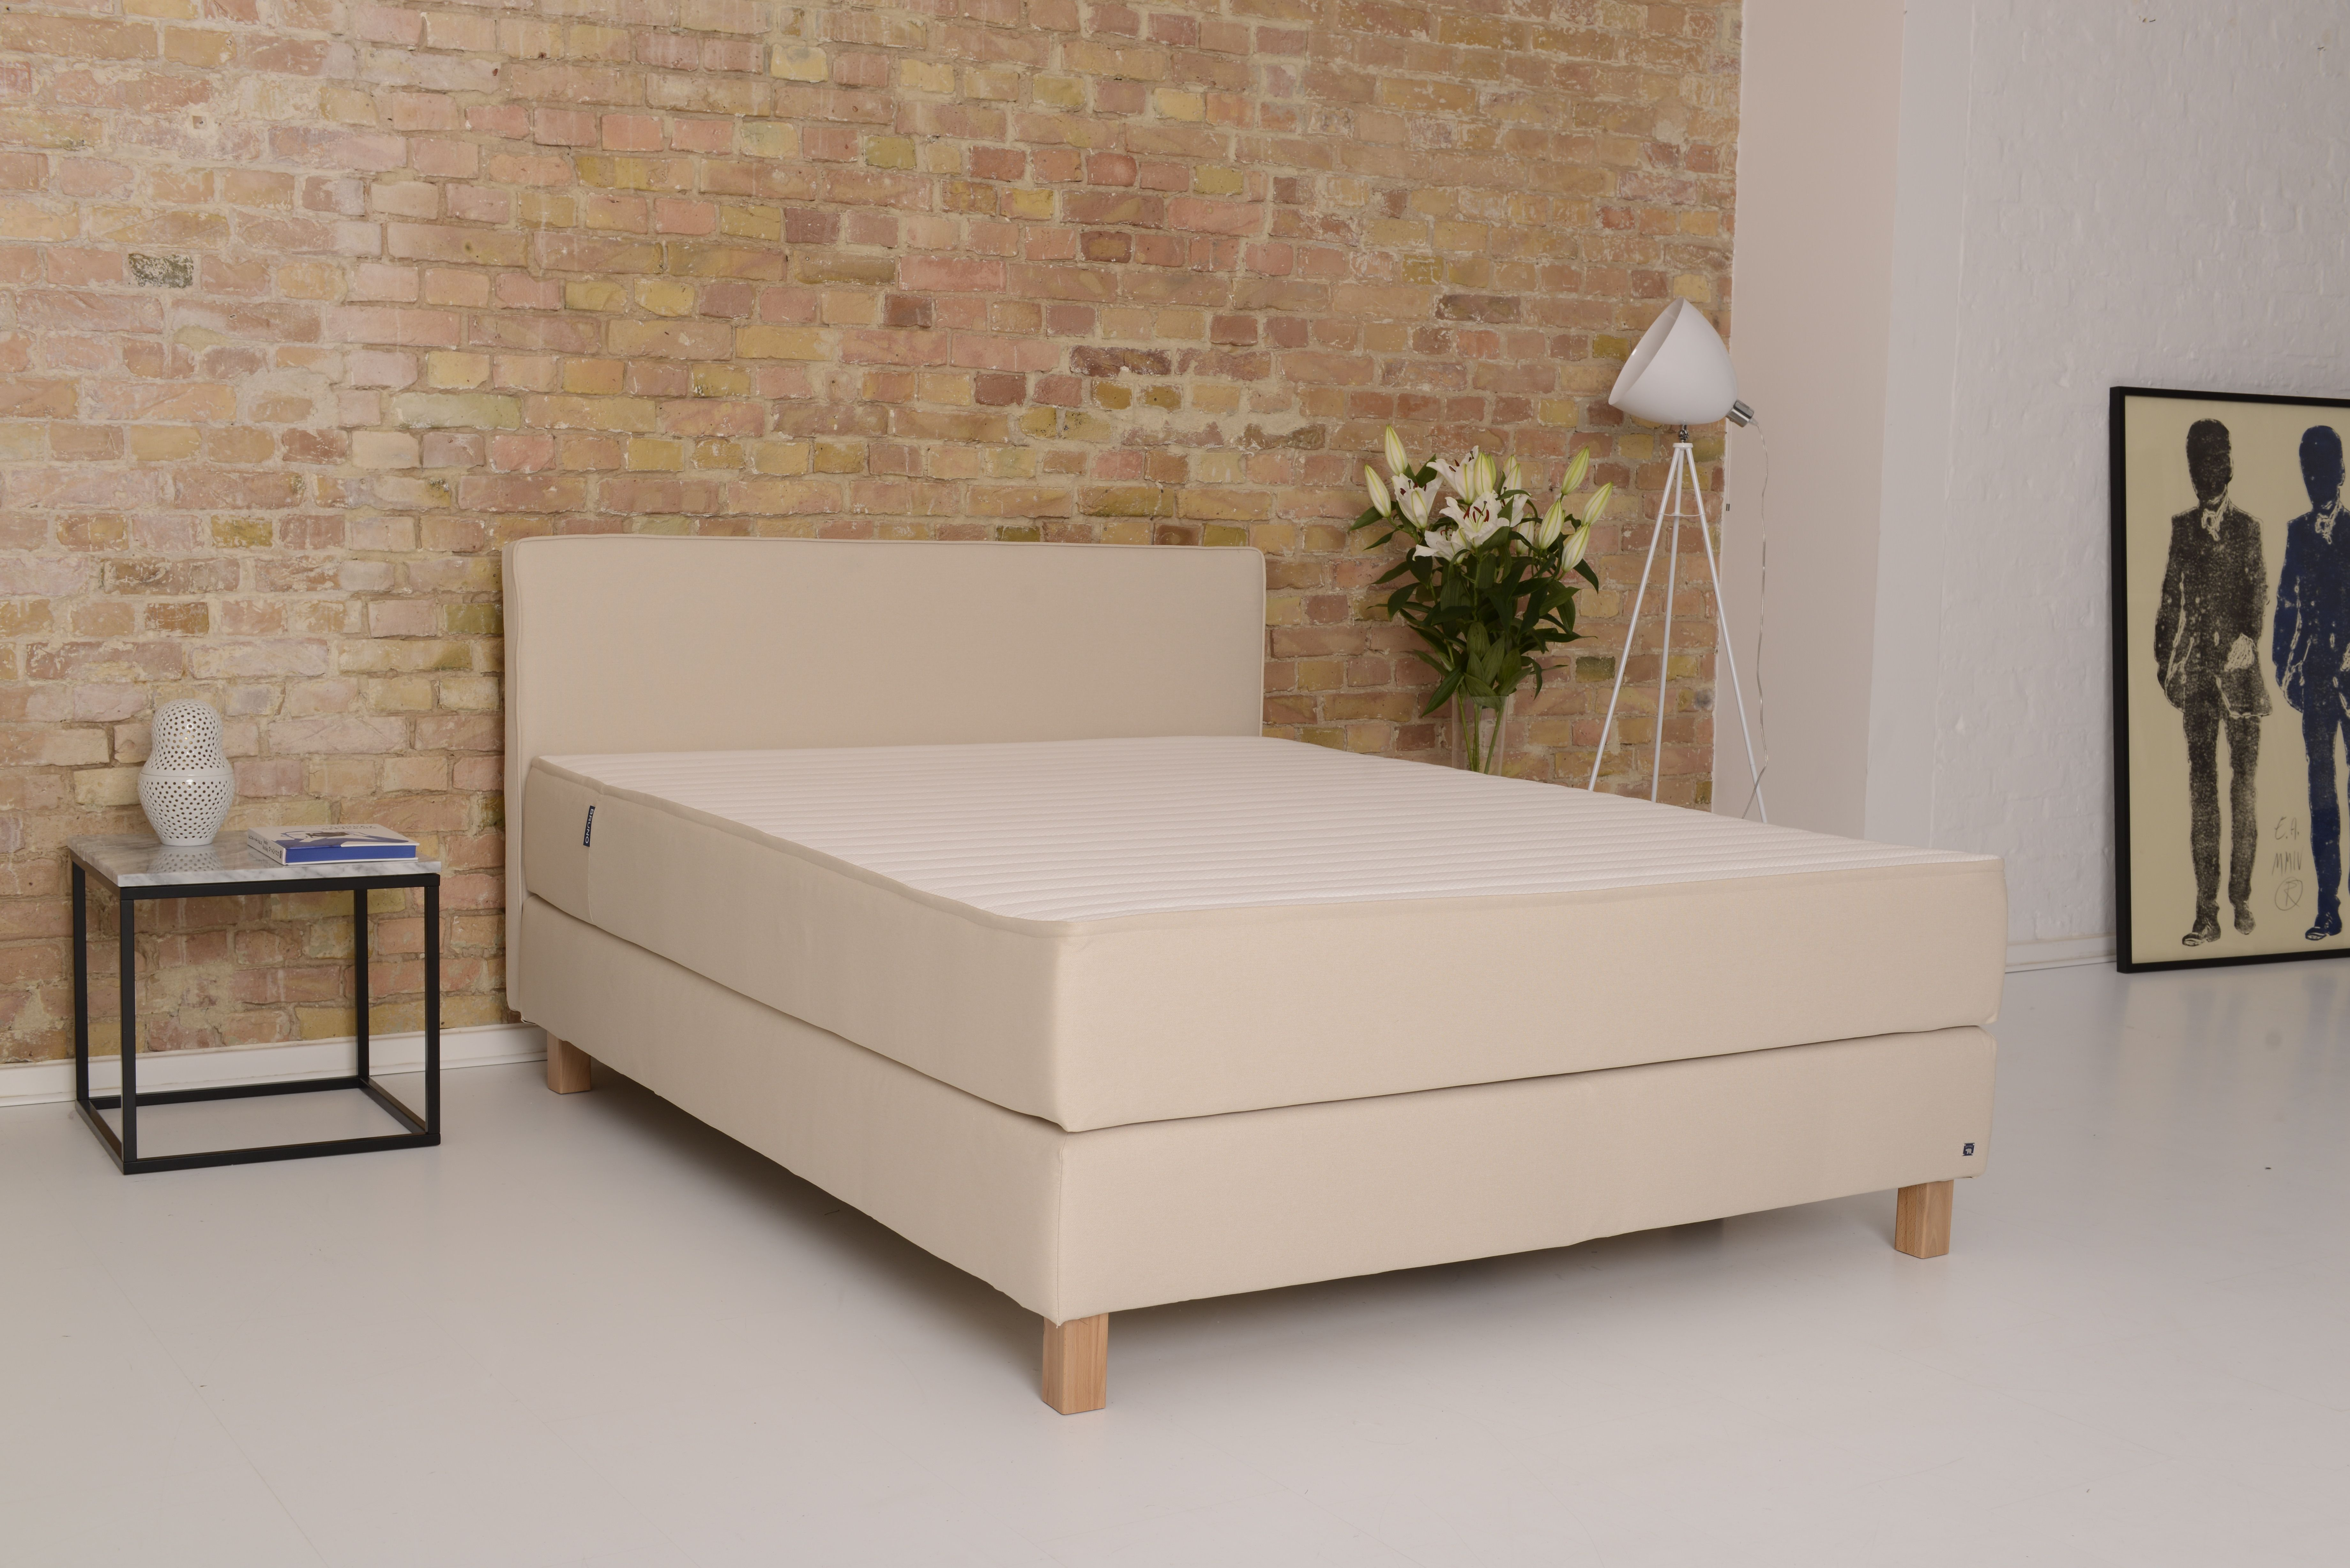 Bruno Boxspringbett Boxspringbett Bett Design